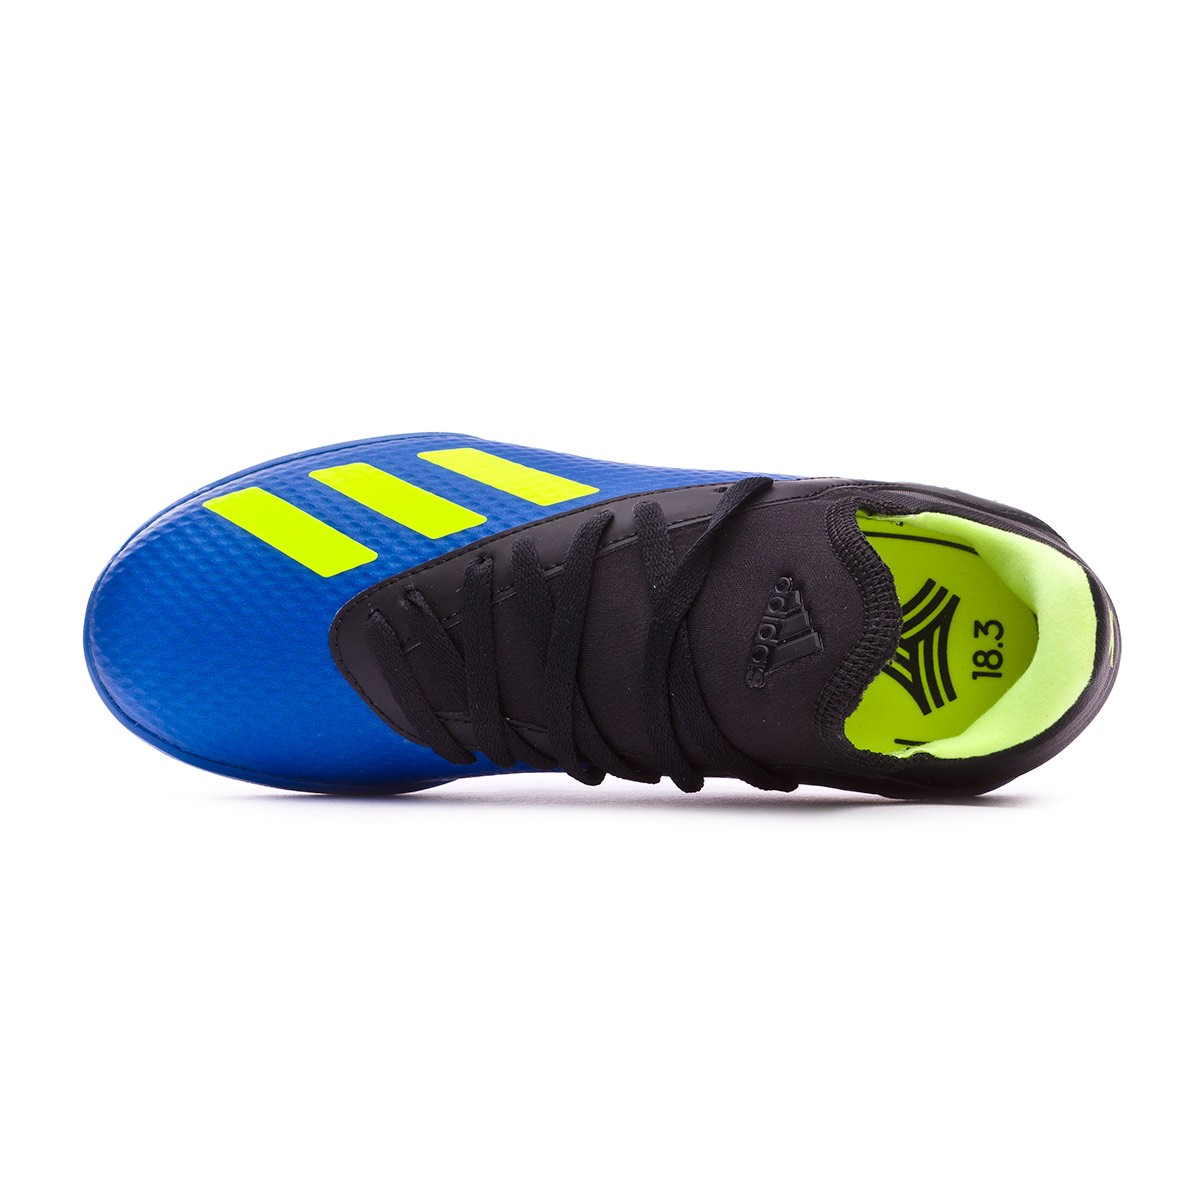 new concept b1d57 a8471 Chaussure de football adidas X Tango 18.3 Turf enfant Foot blue-Solar  yellow-Black - Boutique de football Fútbol Emotion